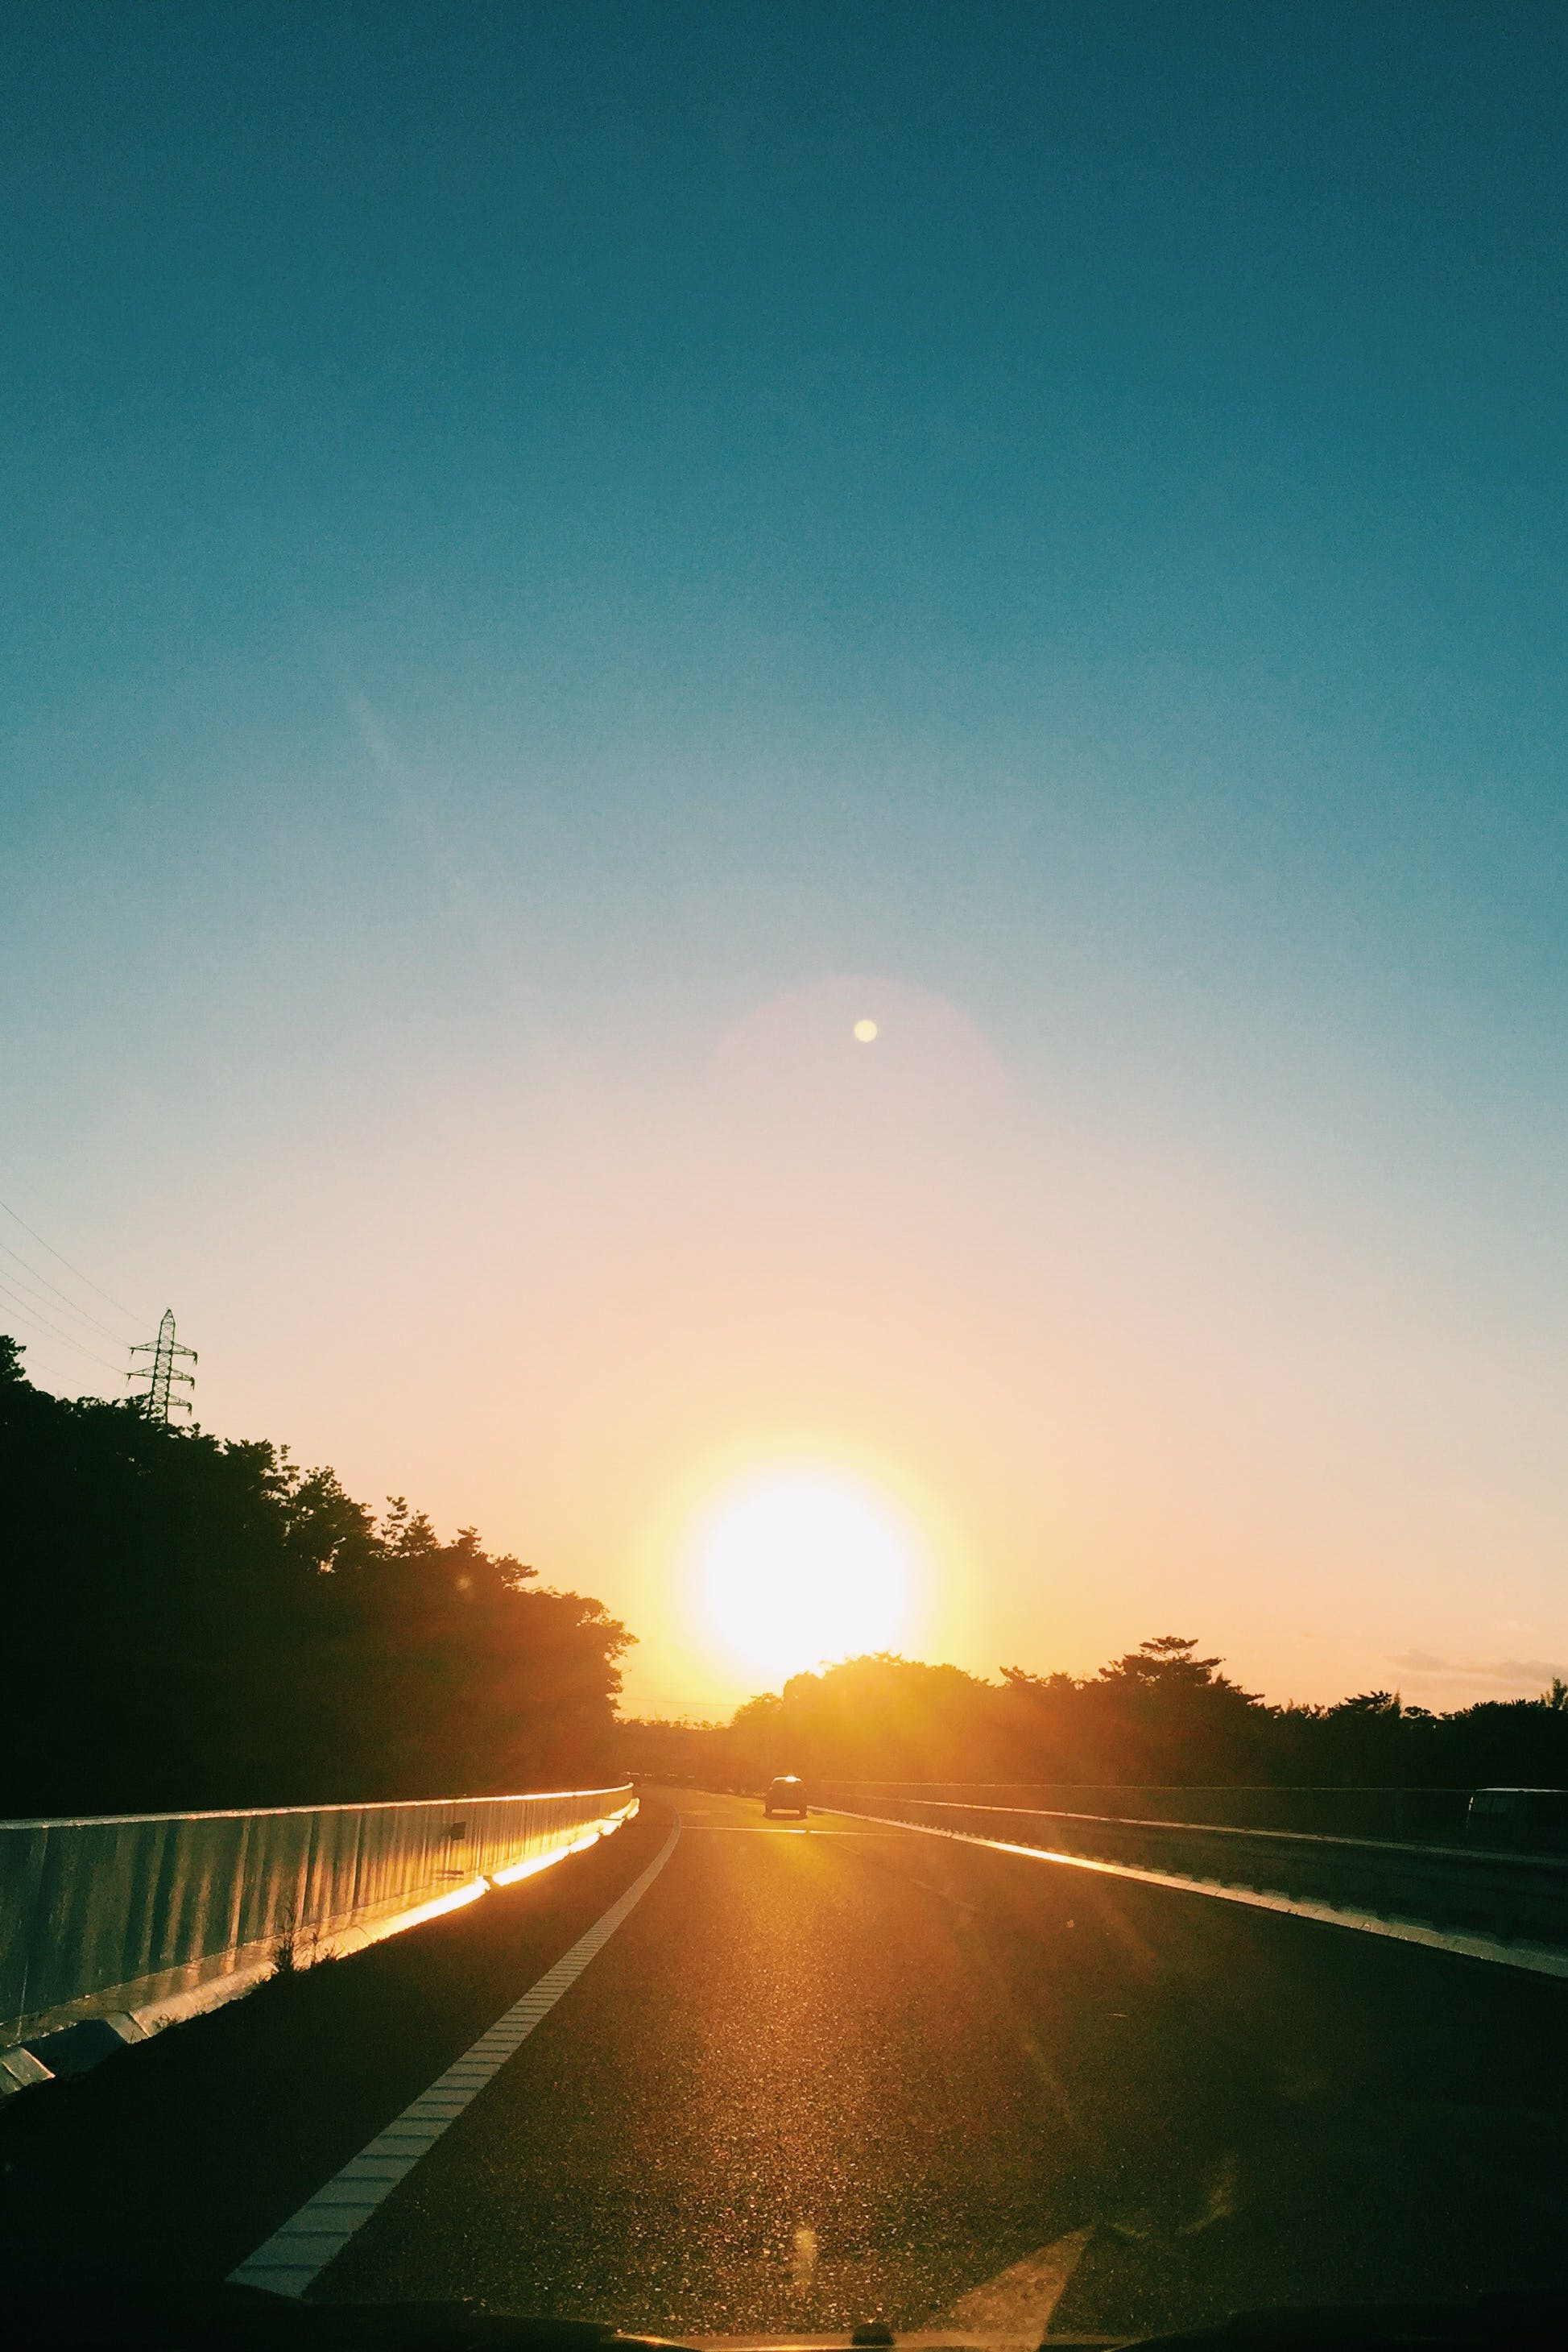 Free stock photo of road, sunset, street, expressway